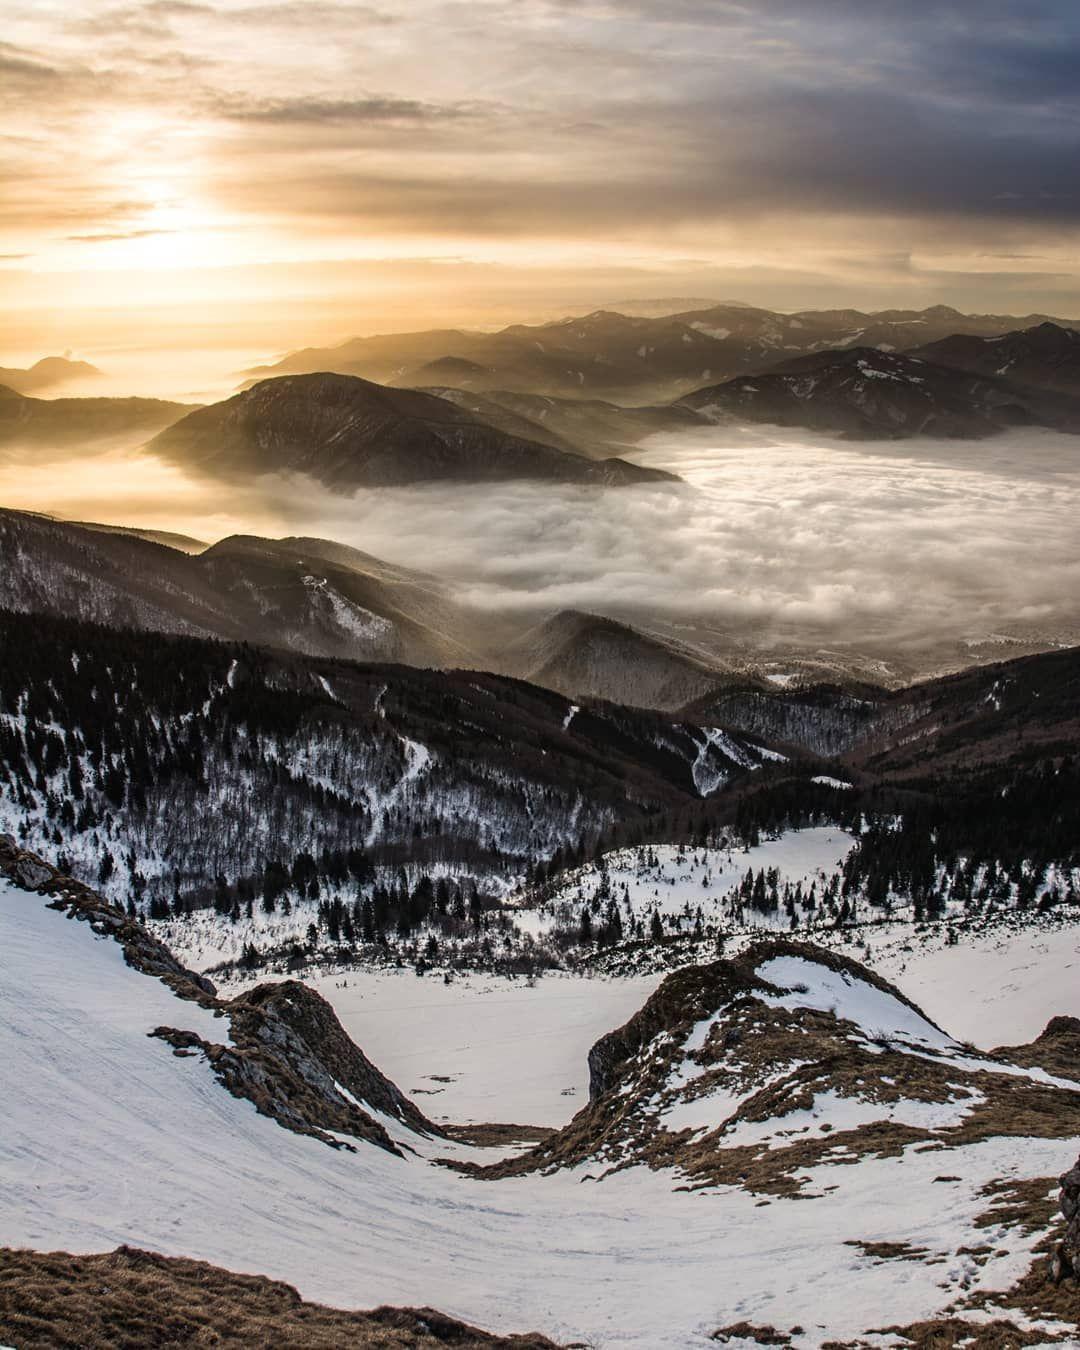 "Kuba Navrátil on Instagram: ""Ty rána jsou občas boží. . #slovakiamountains #slovakadventures #turistikanaslovensku  #slovakianature #na_hory #praveslovenske…"""